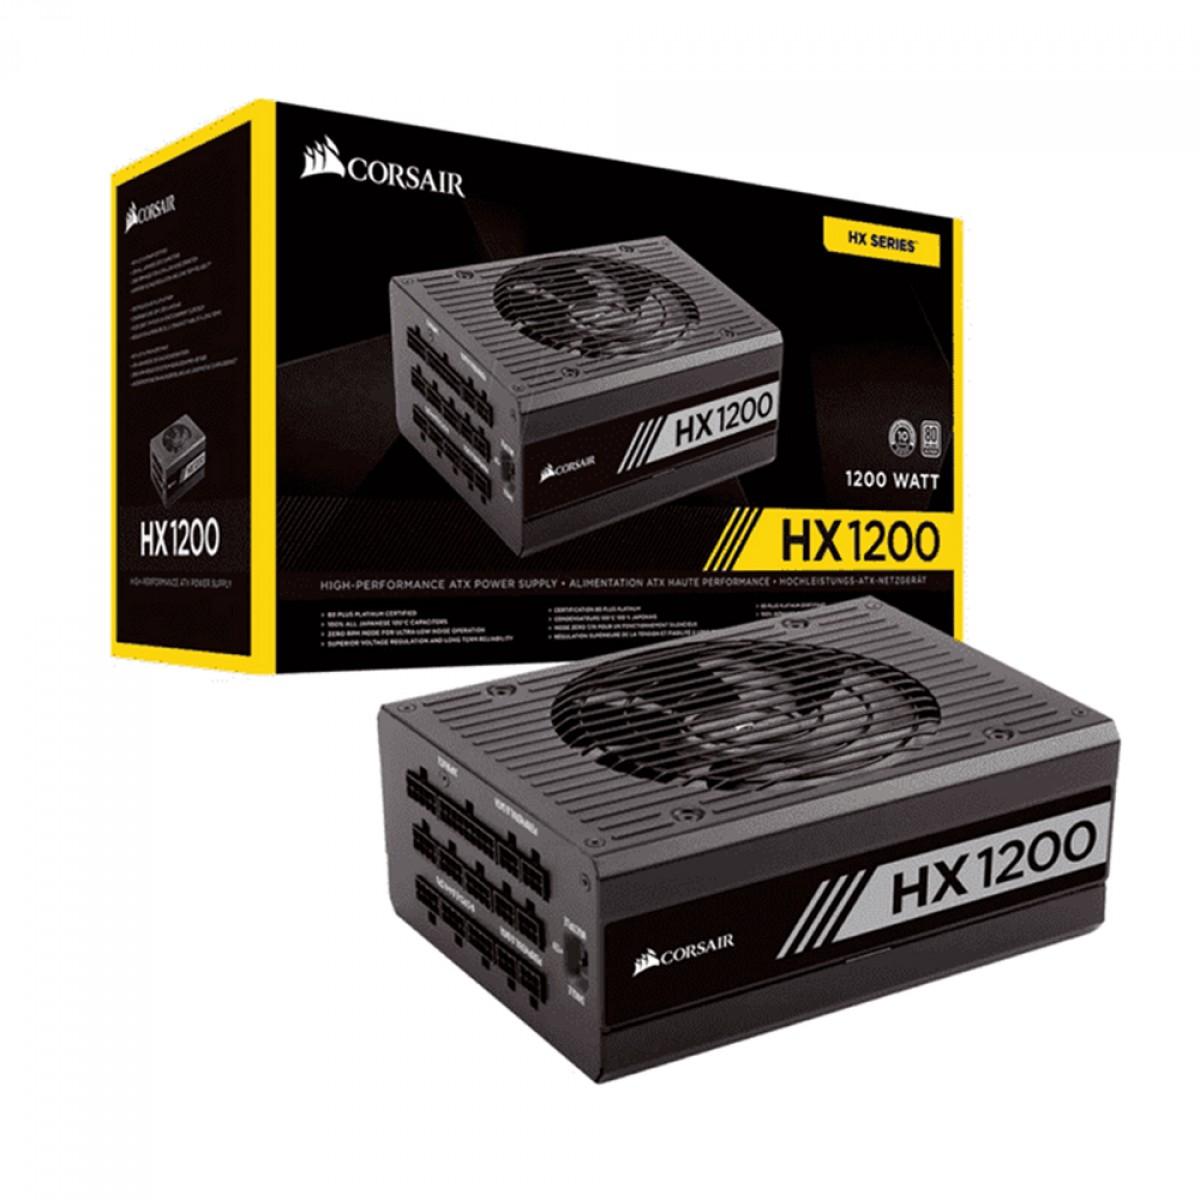 Fonte Corsair HX1200 CP-9020140-WW 1200W 80 Plus Platinum PFC Ativo Modular, CP-9020140-WW